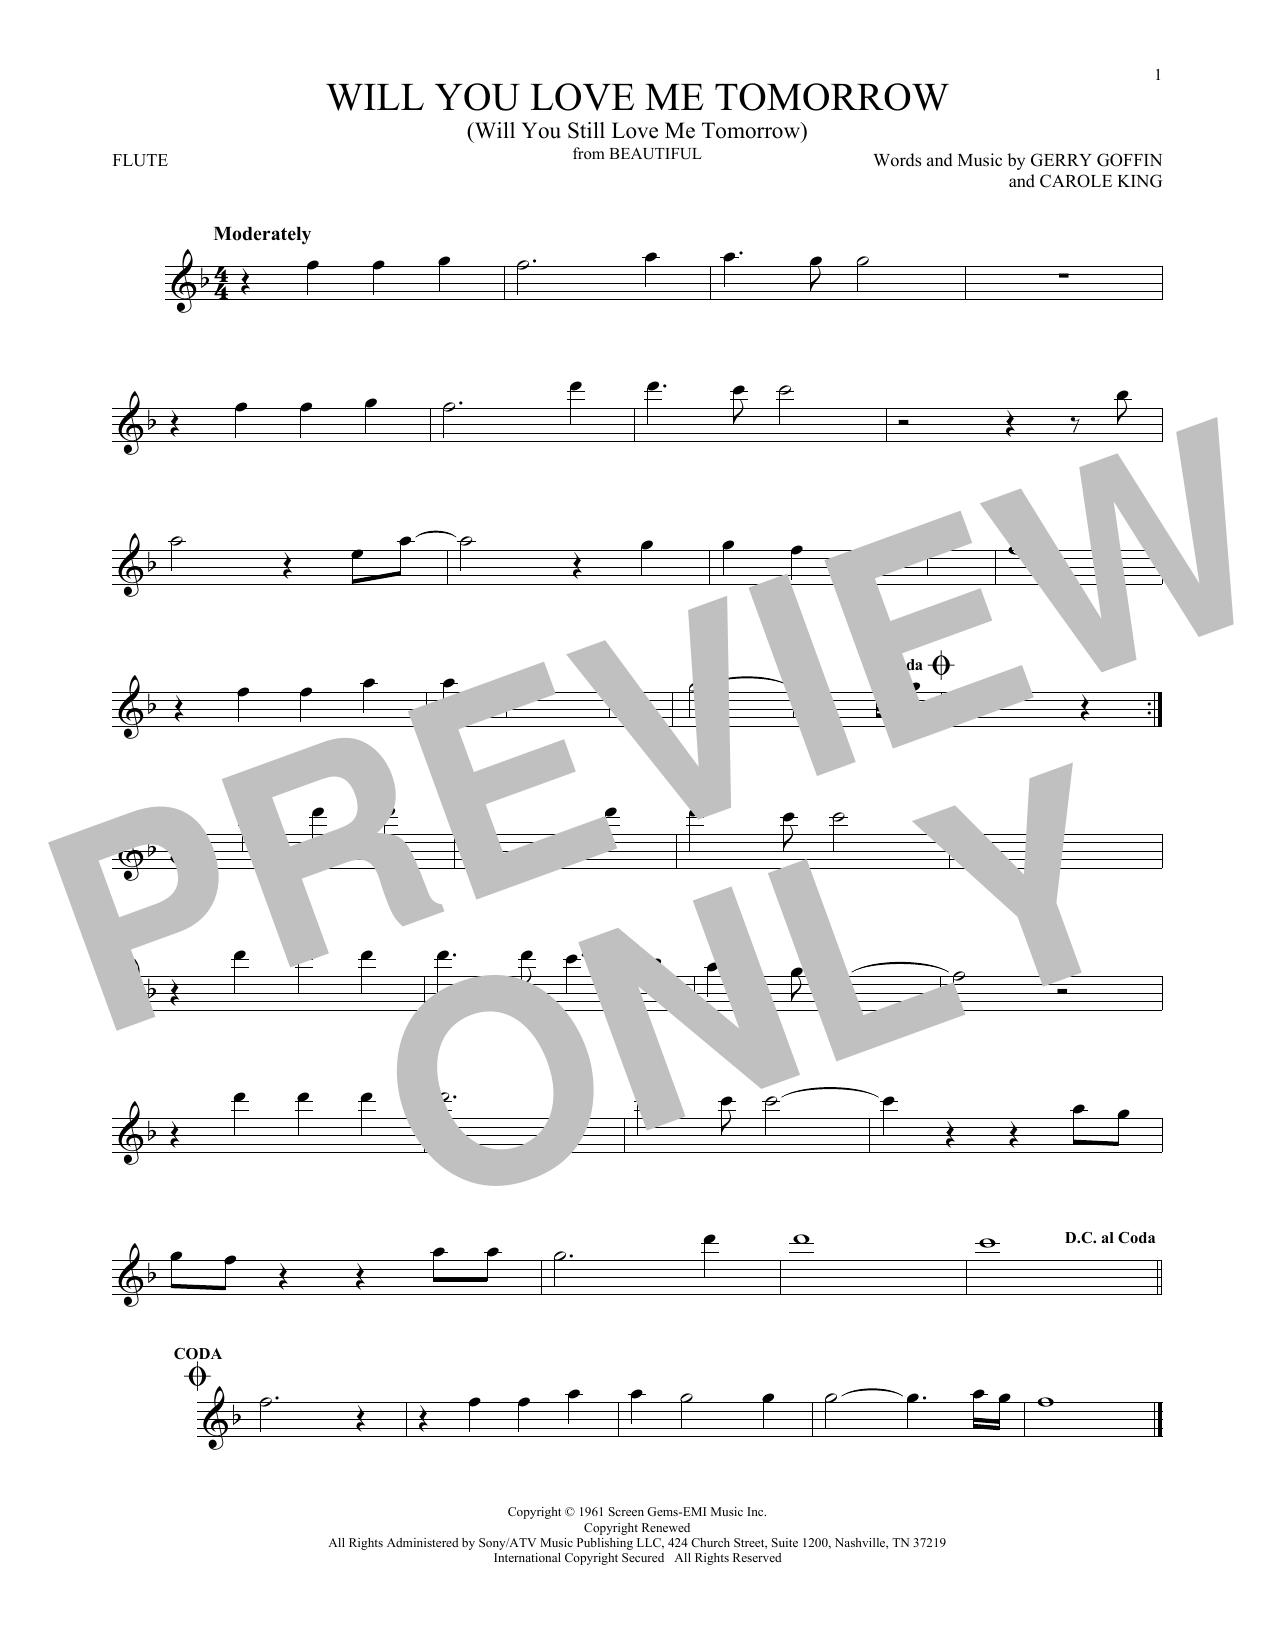 Will You Love Me Tomorrow (Will You Still Love Me Tomorrow) (Flute Solo)